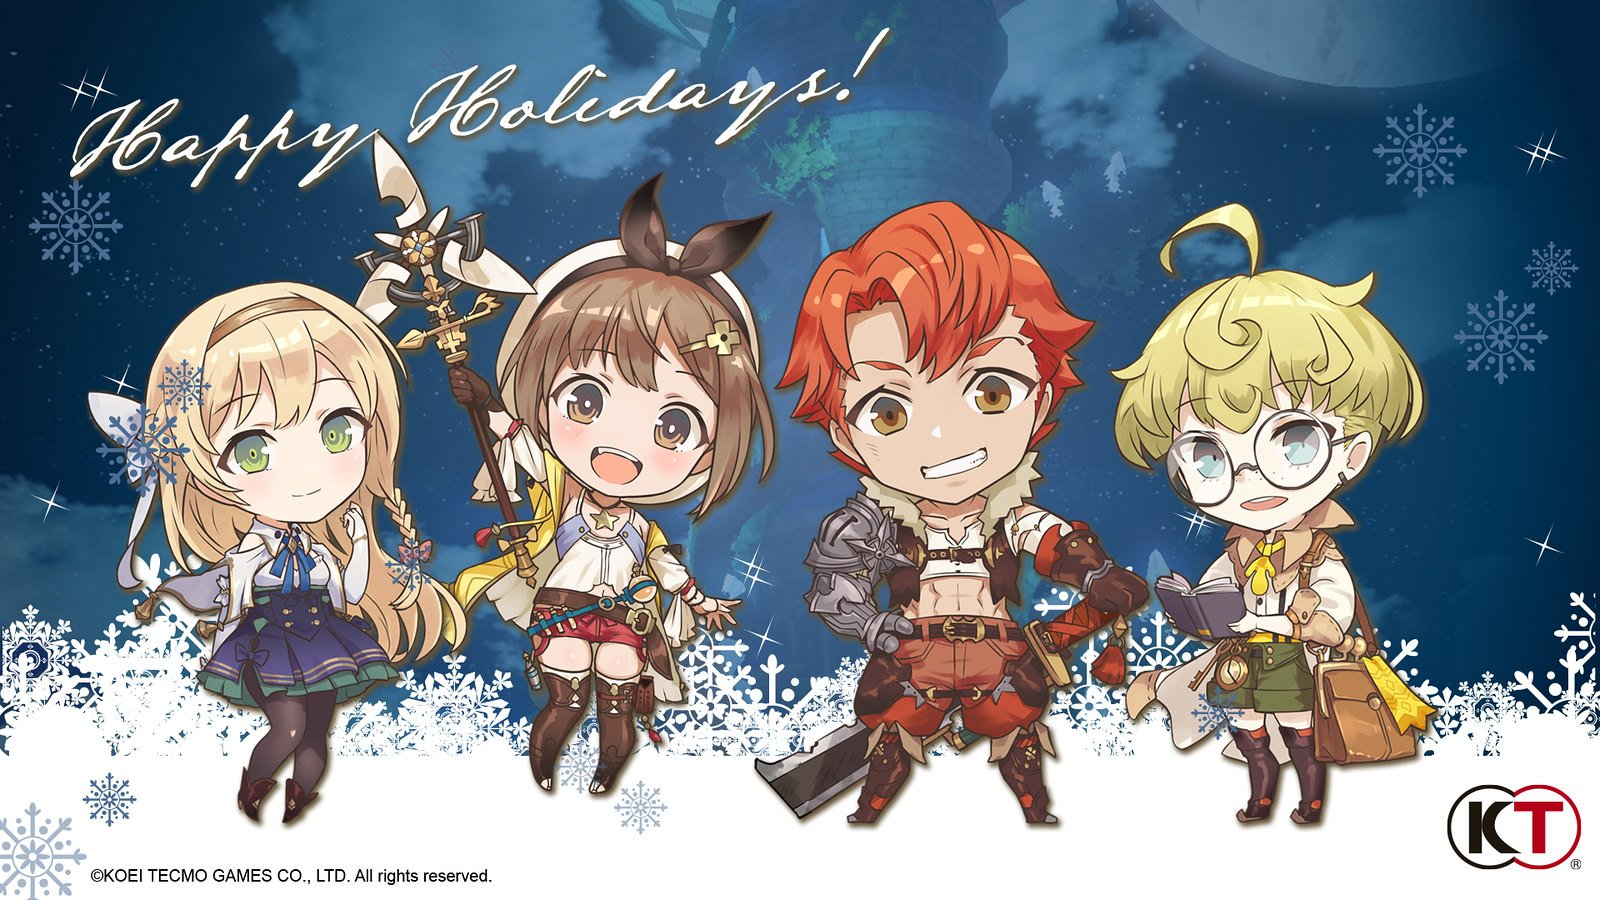 Koei Tecmo Happy Holidays Wallpaper